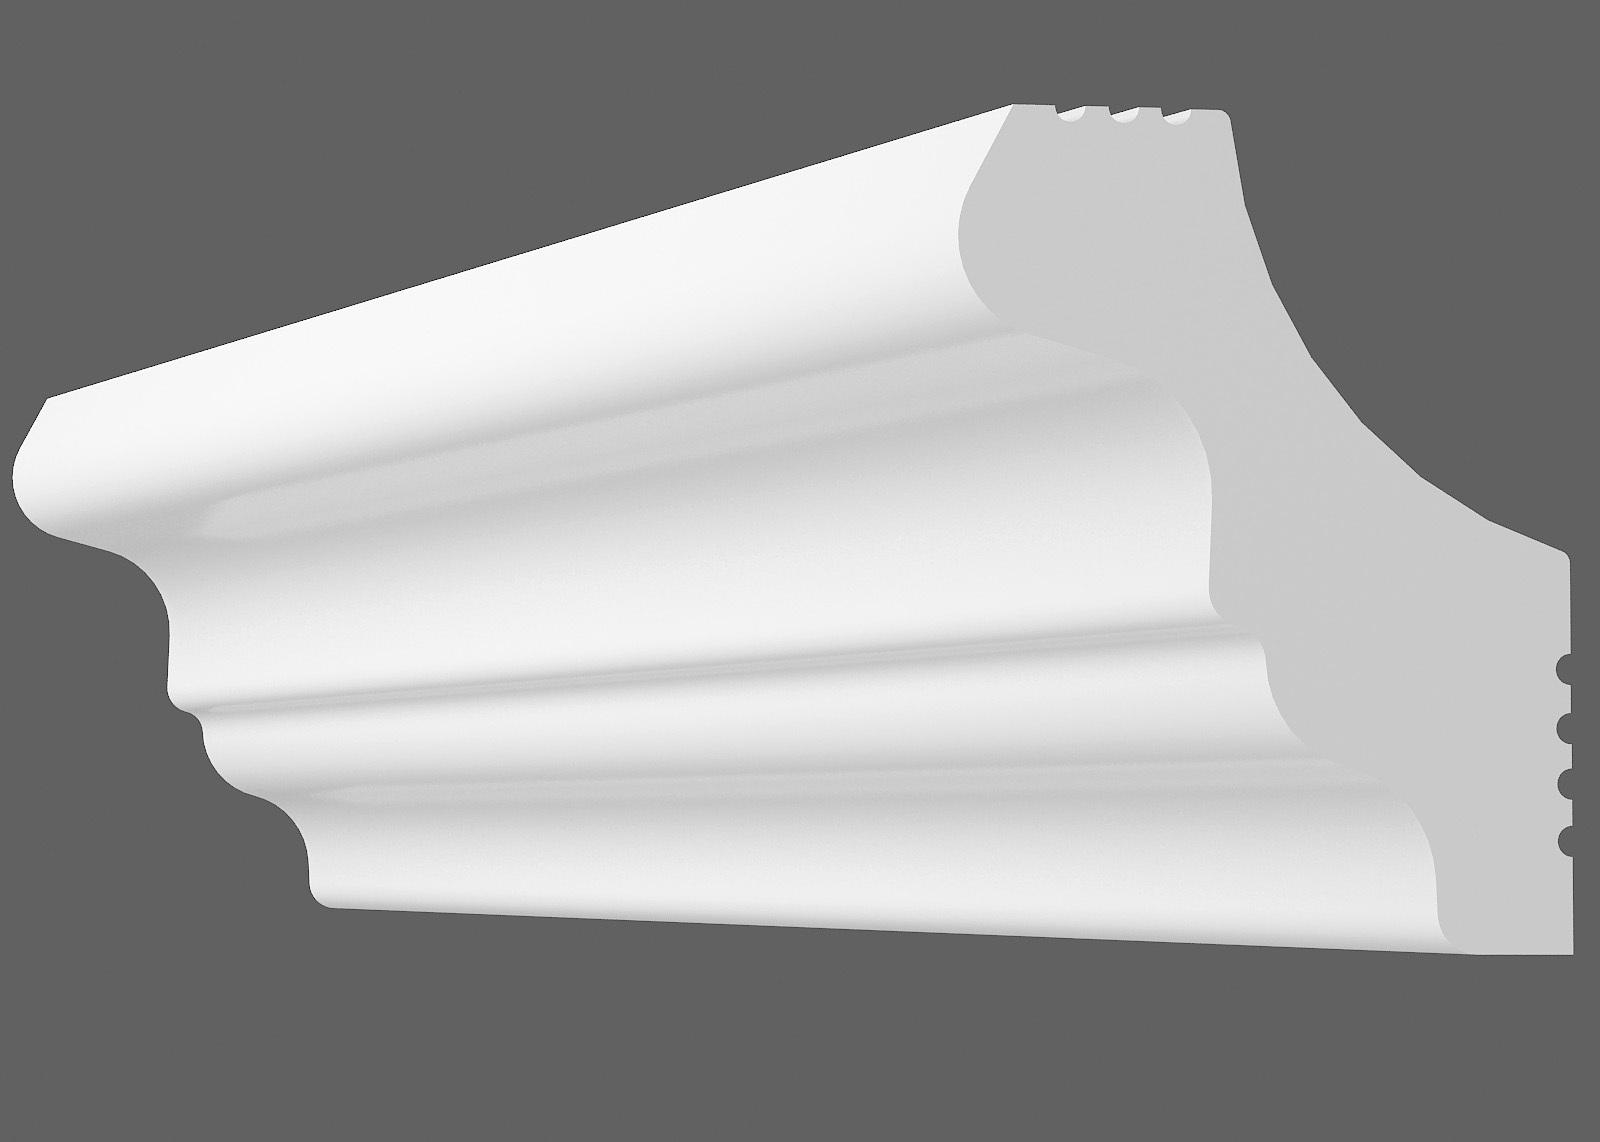 Потолочный плинтус S-35 (Размер:25х25мм)